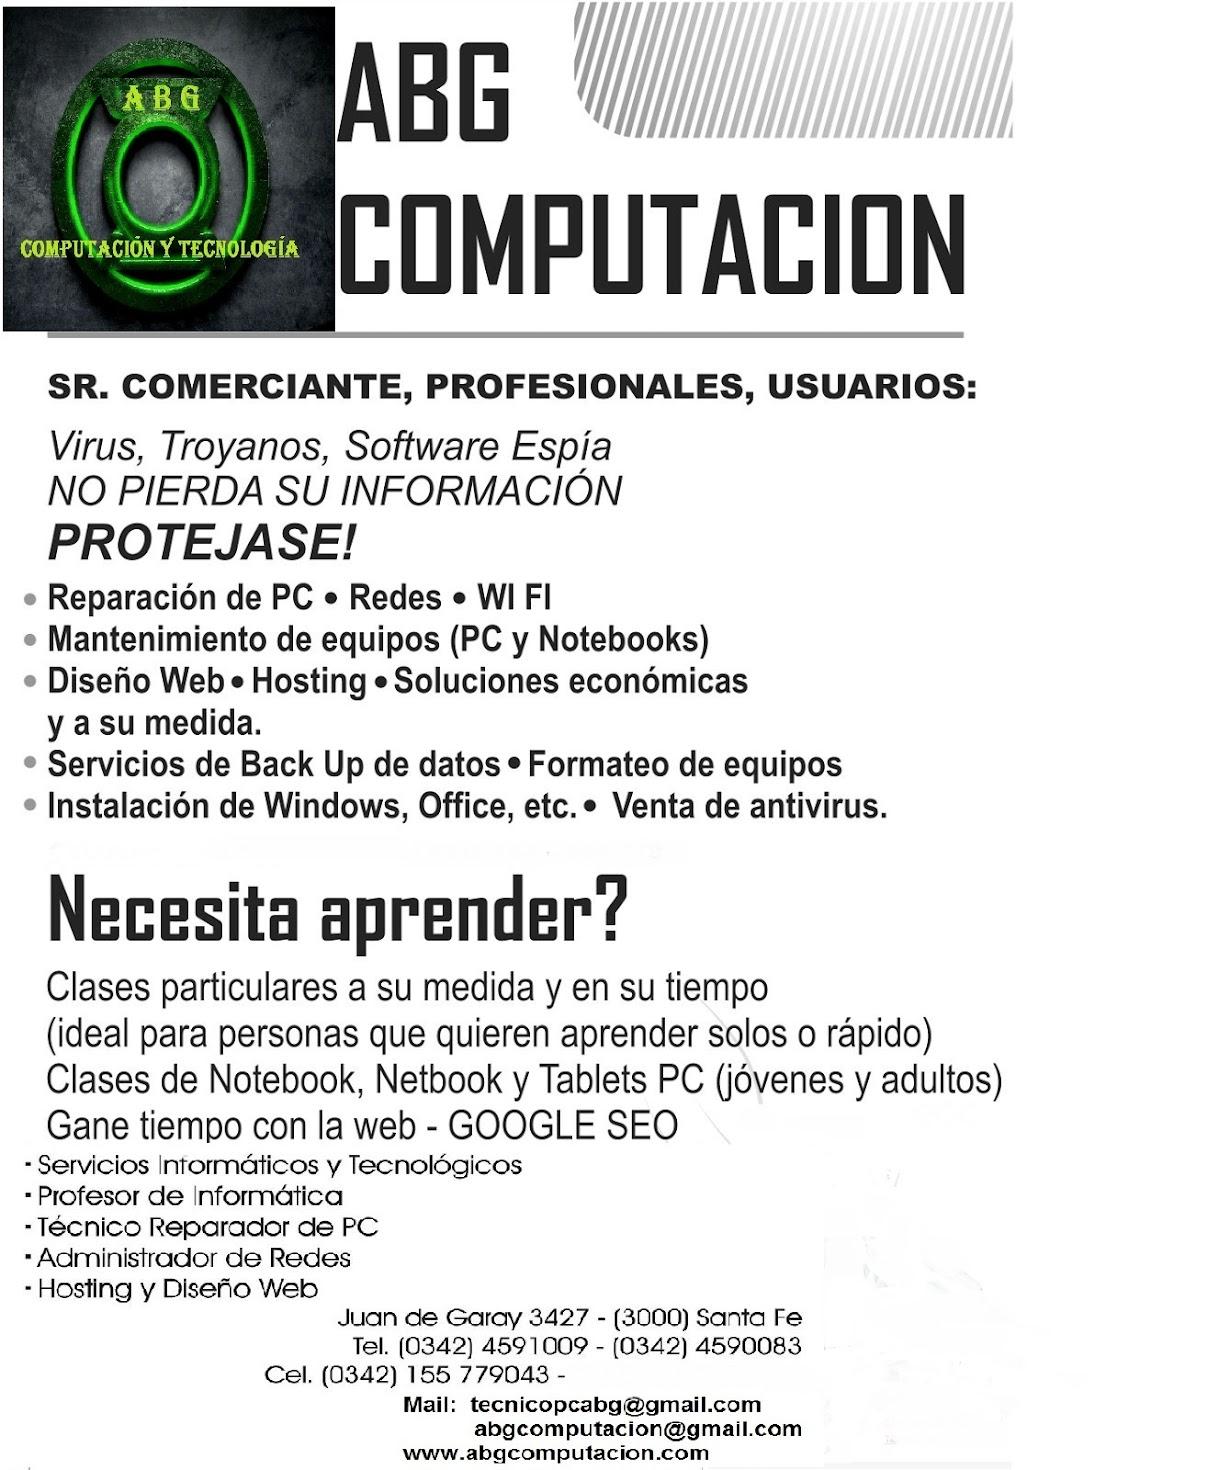 A B G - COMPUTACION  y  TECNOLOGIA